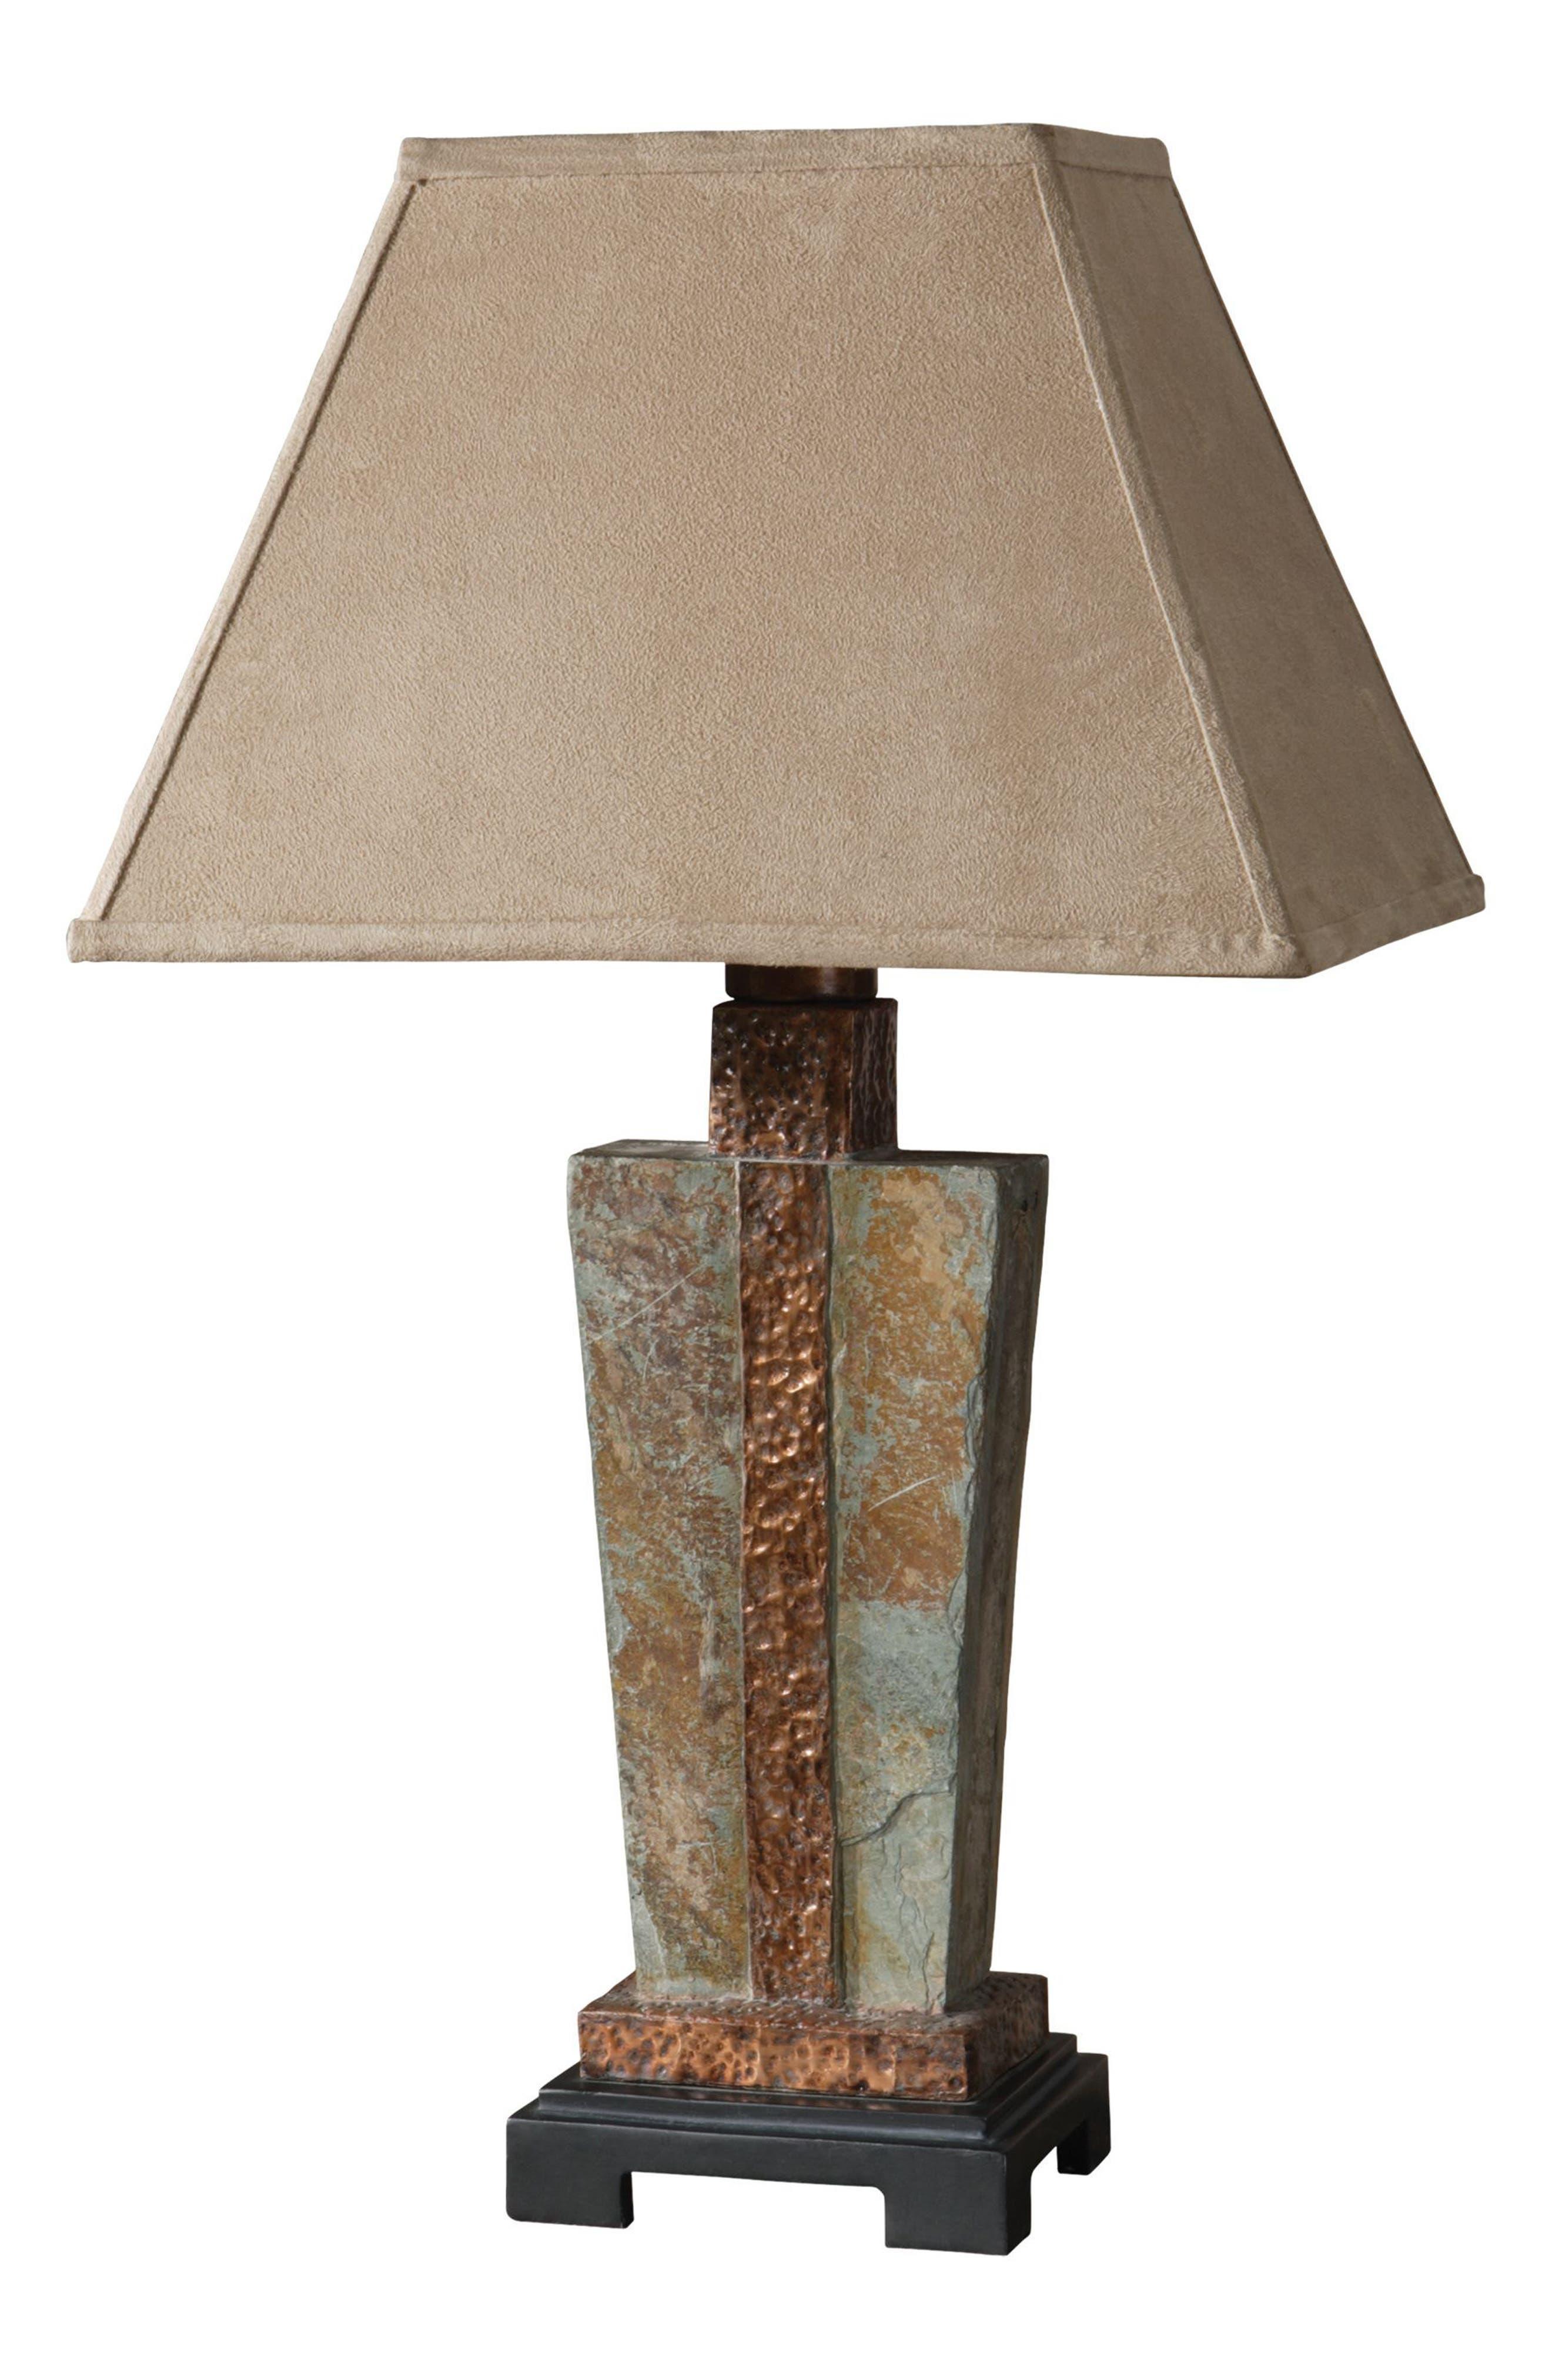 Slate Table Lamp,                         Main,                         color, Metallic Rust/ Copper